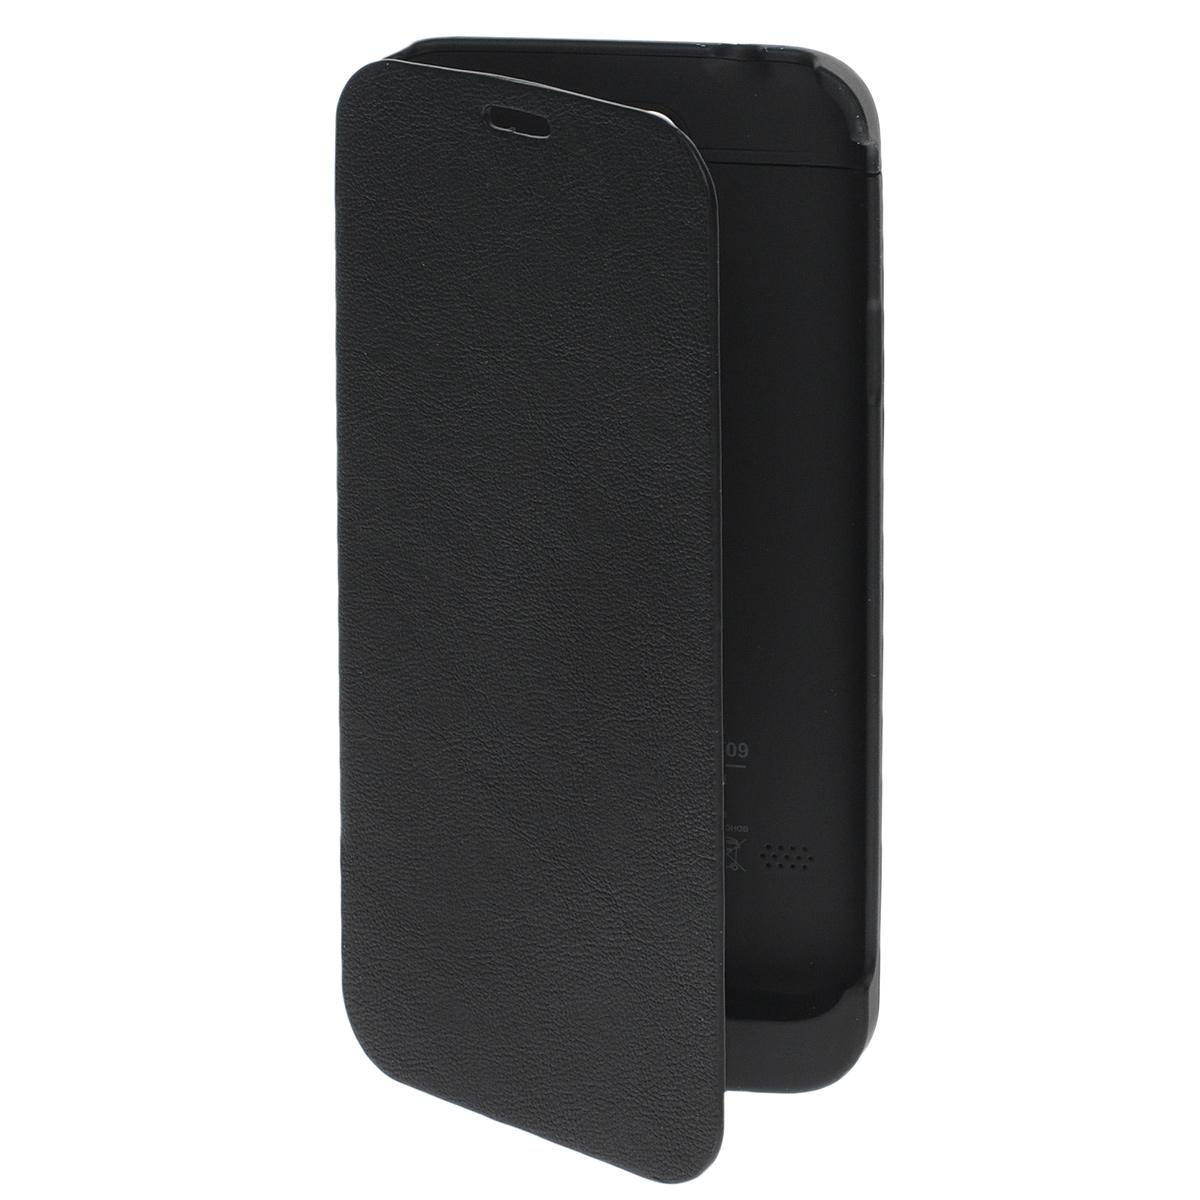 EXEQ HelpinG-SF09 чехол-аккумулятор для Samsung Galaxy S5, Black (3300 мАч, флип-кейс)